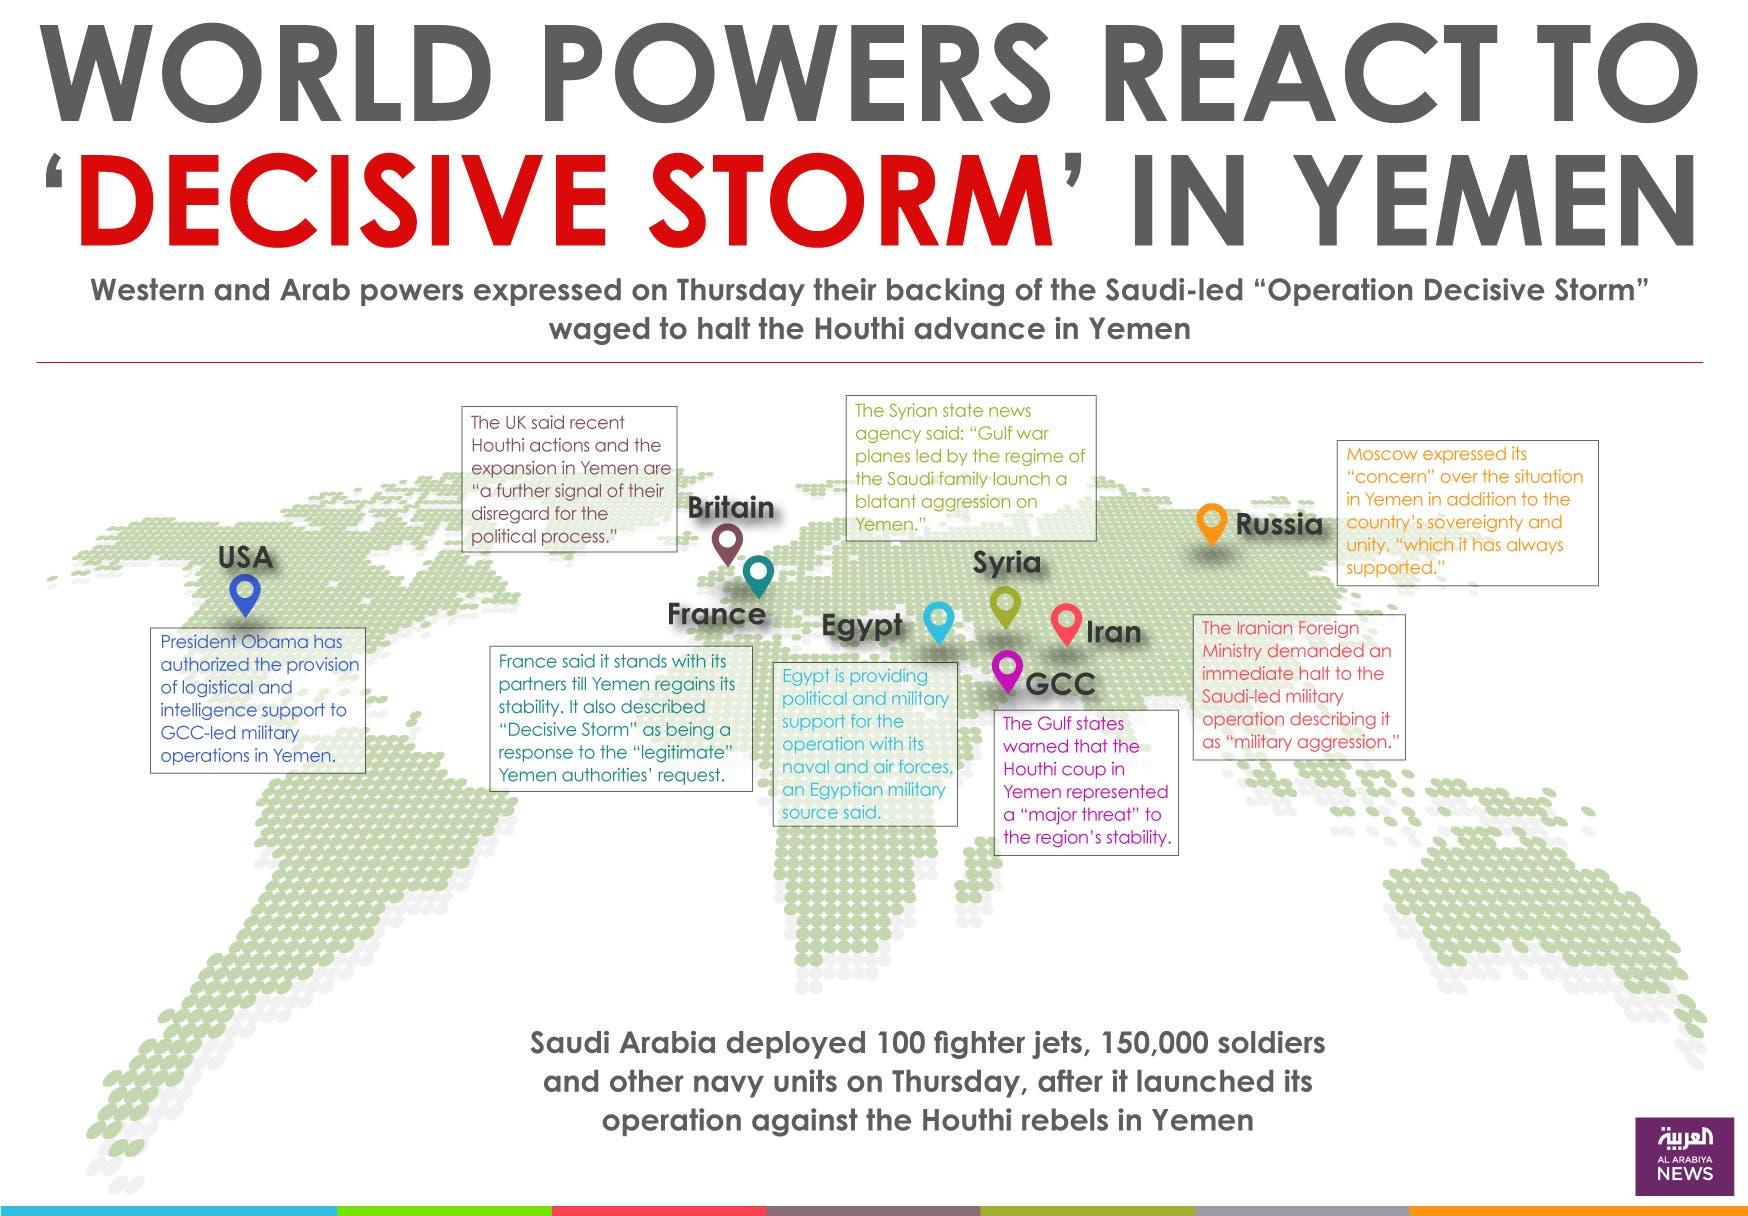 Infographic: World powers react to 'Decisive Storm' in Yemen